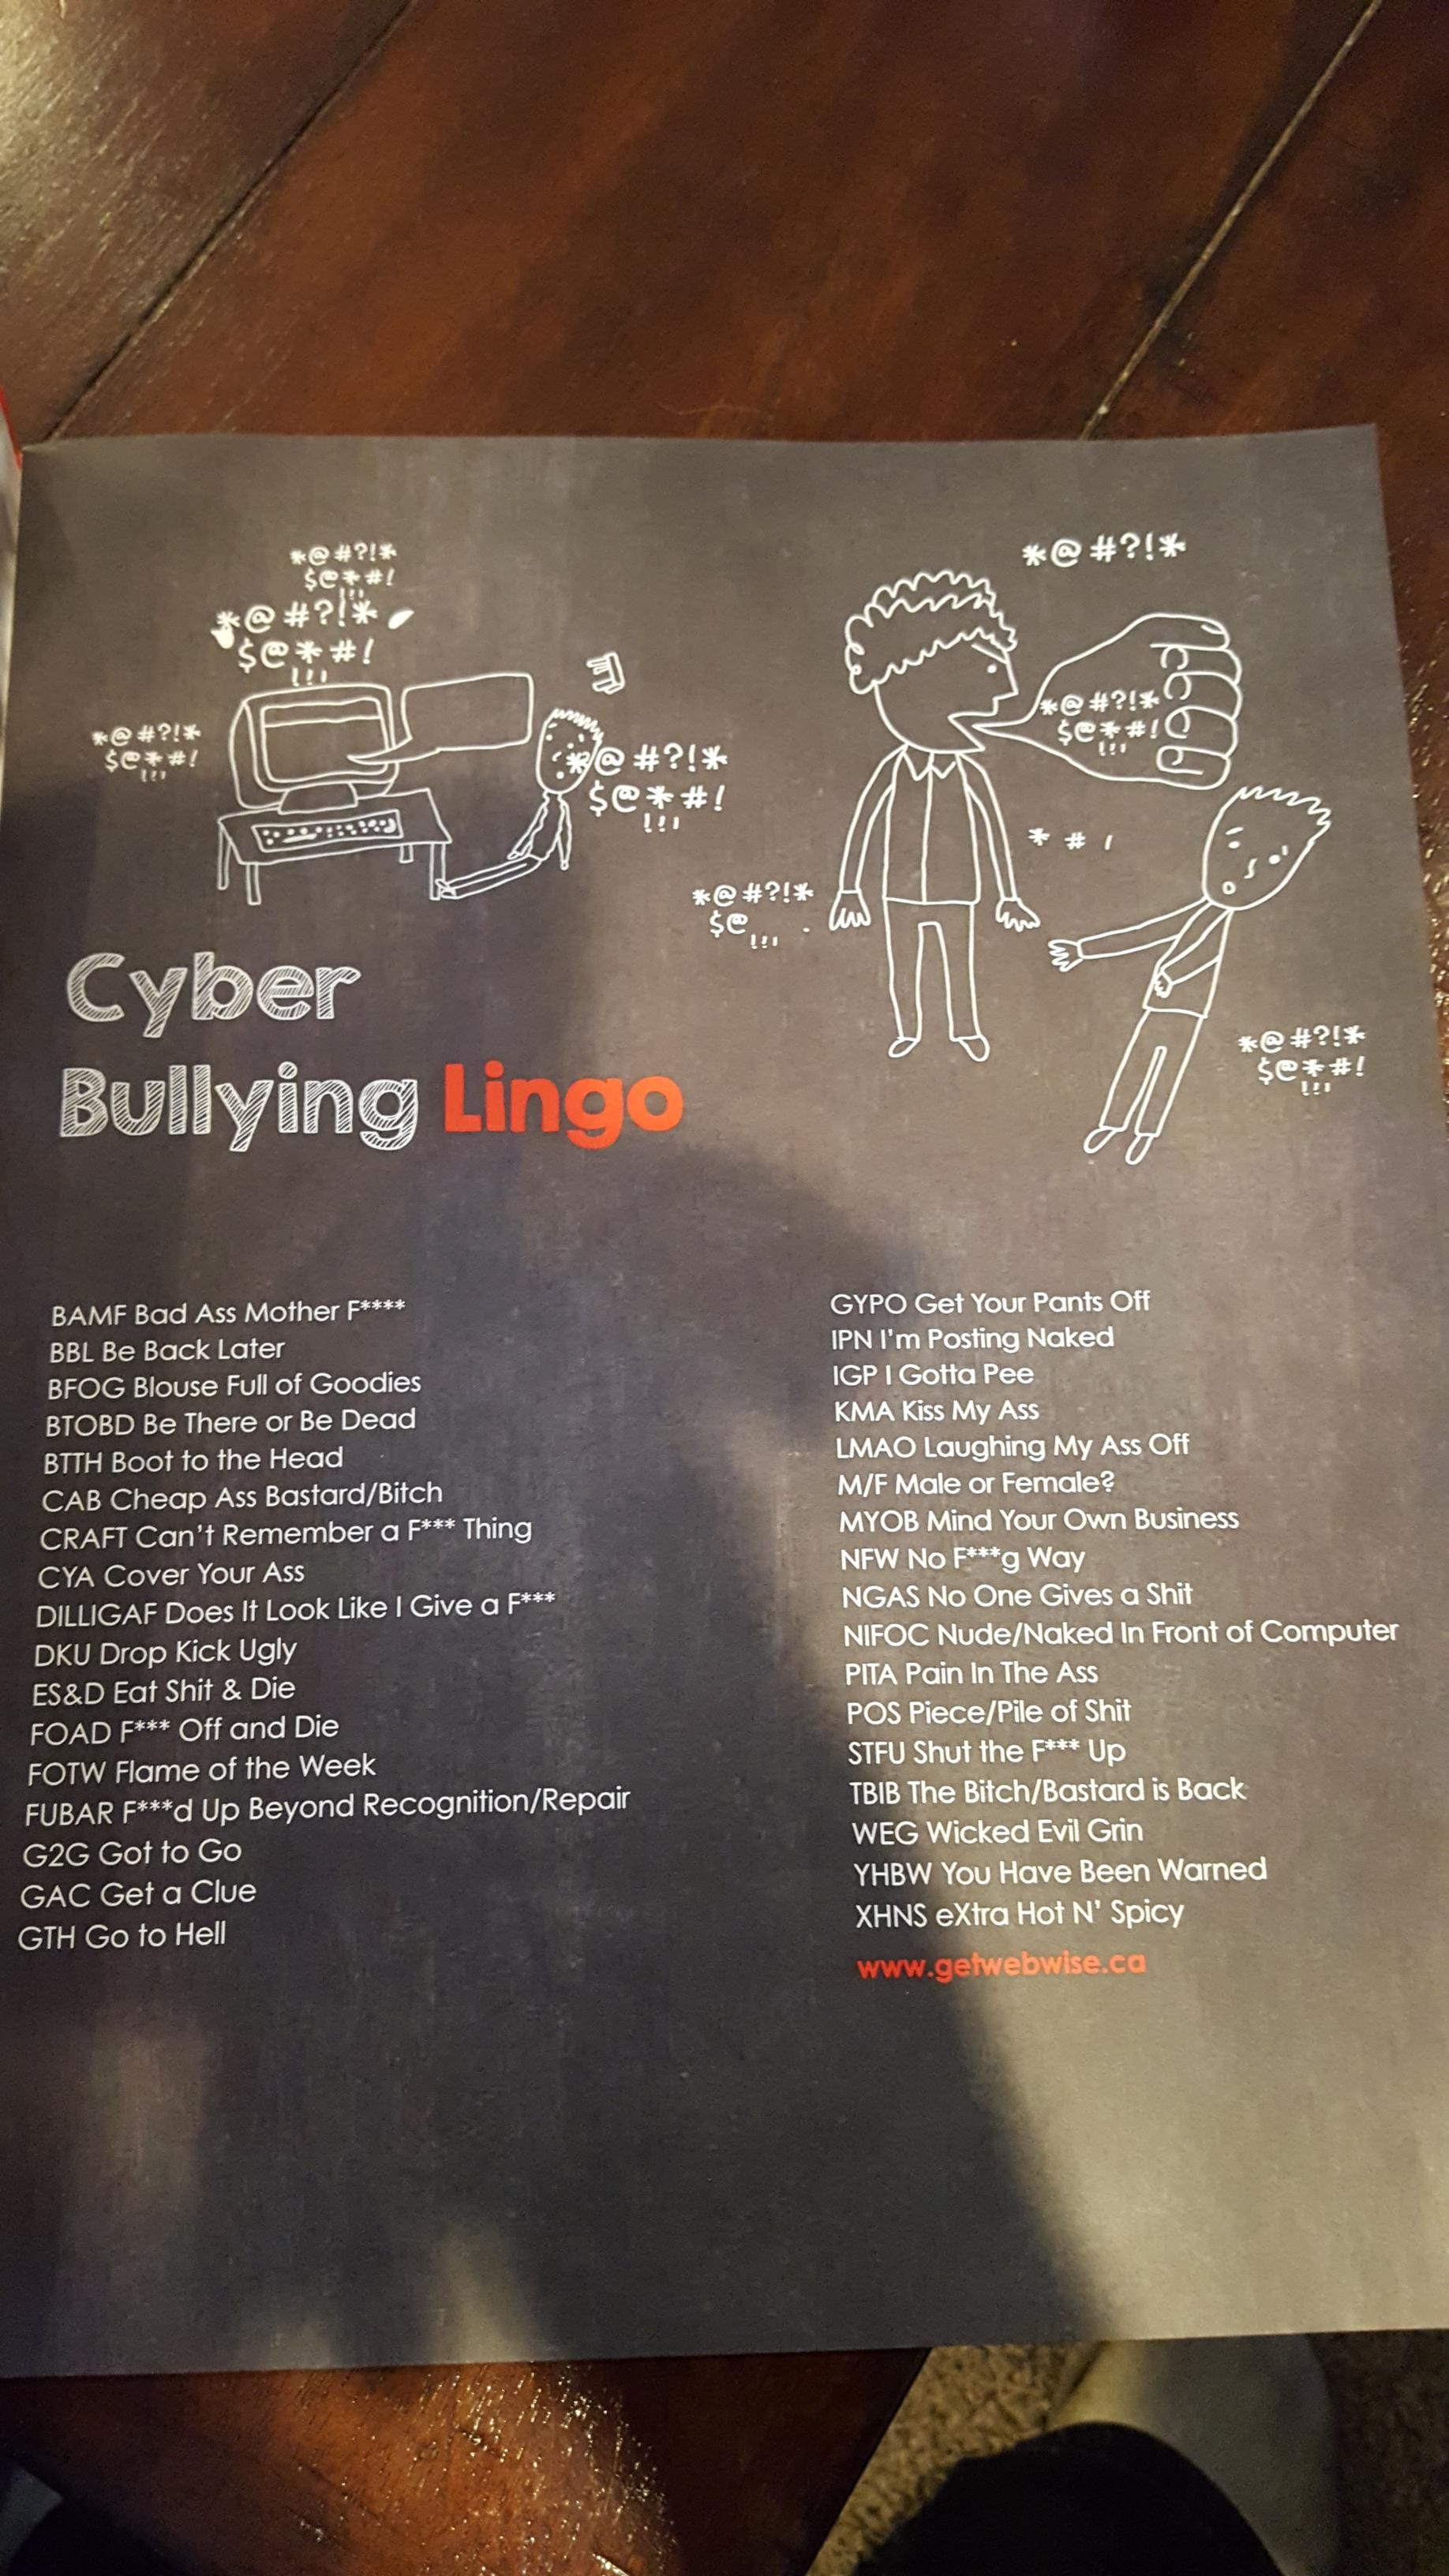 cyber bullying lingo my nephew brought home  [ 1836 x 3264 Pixel ]